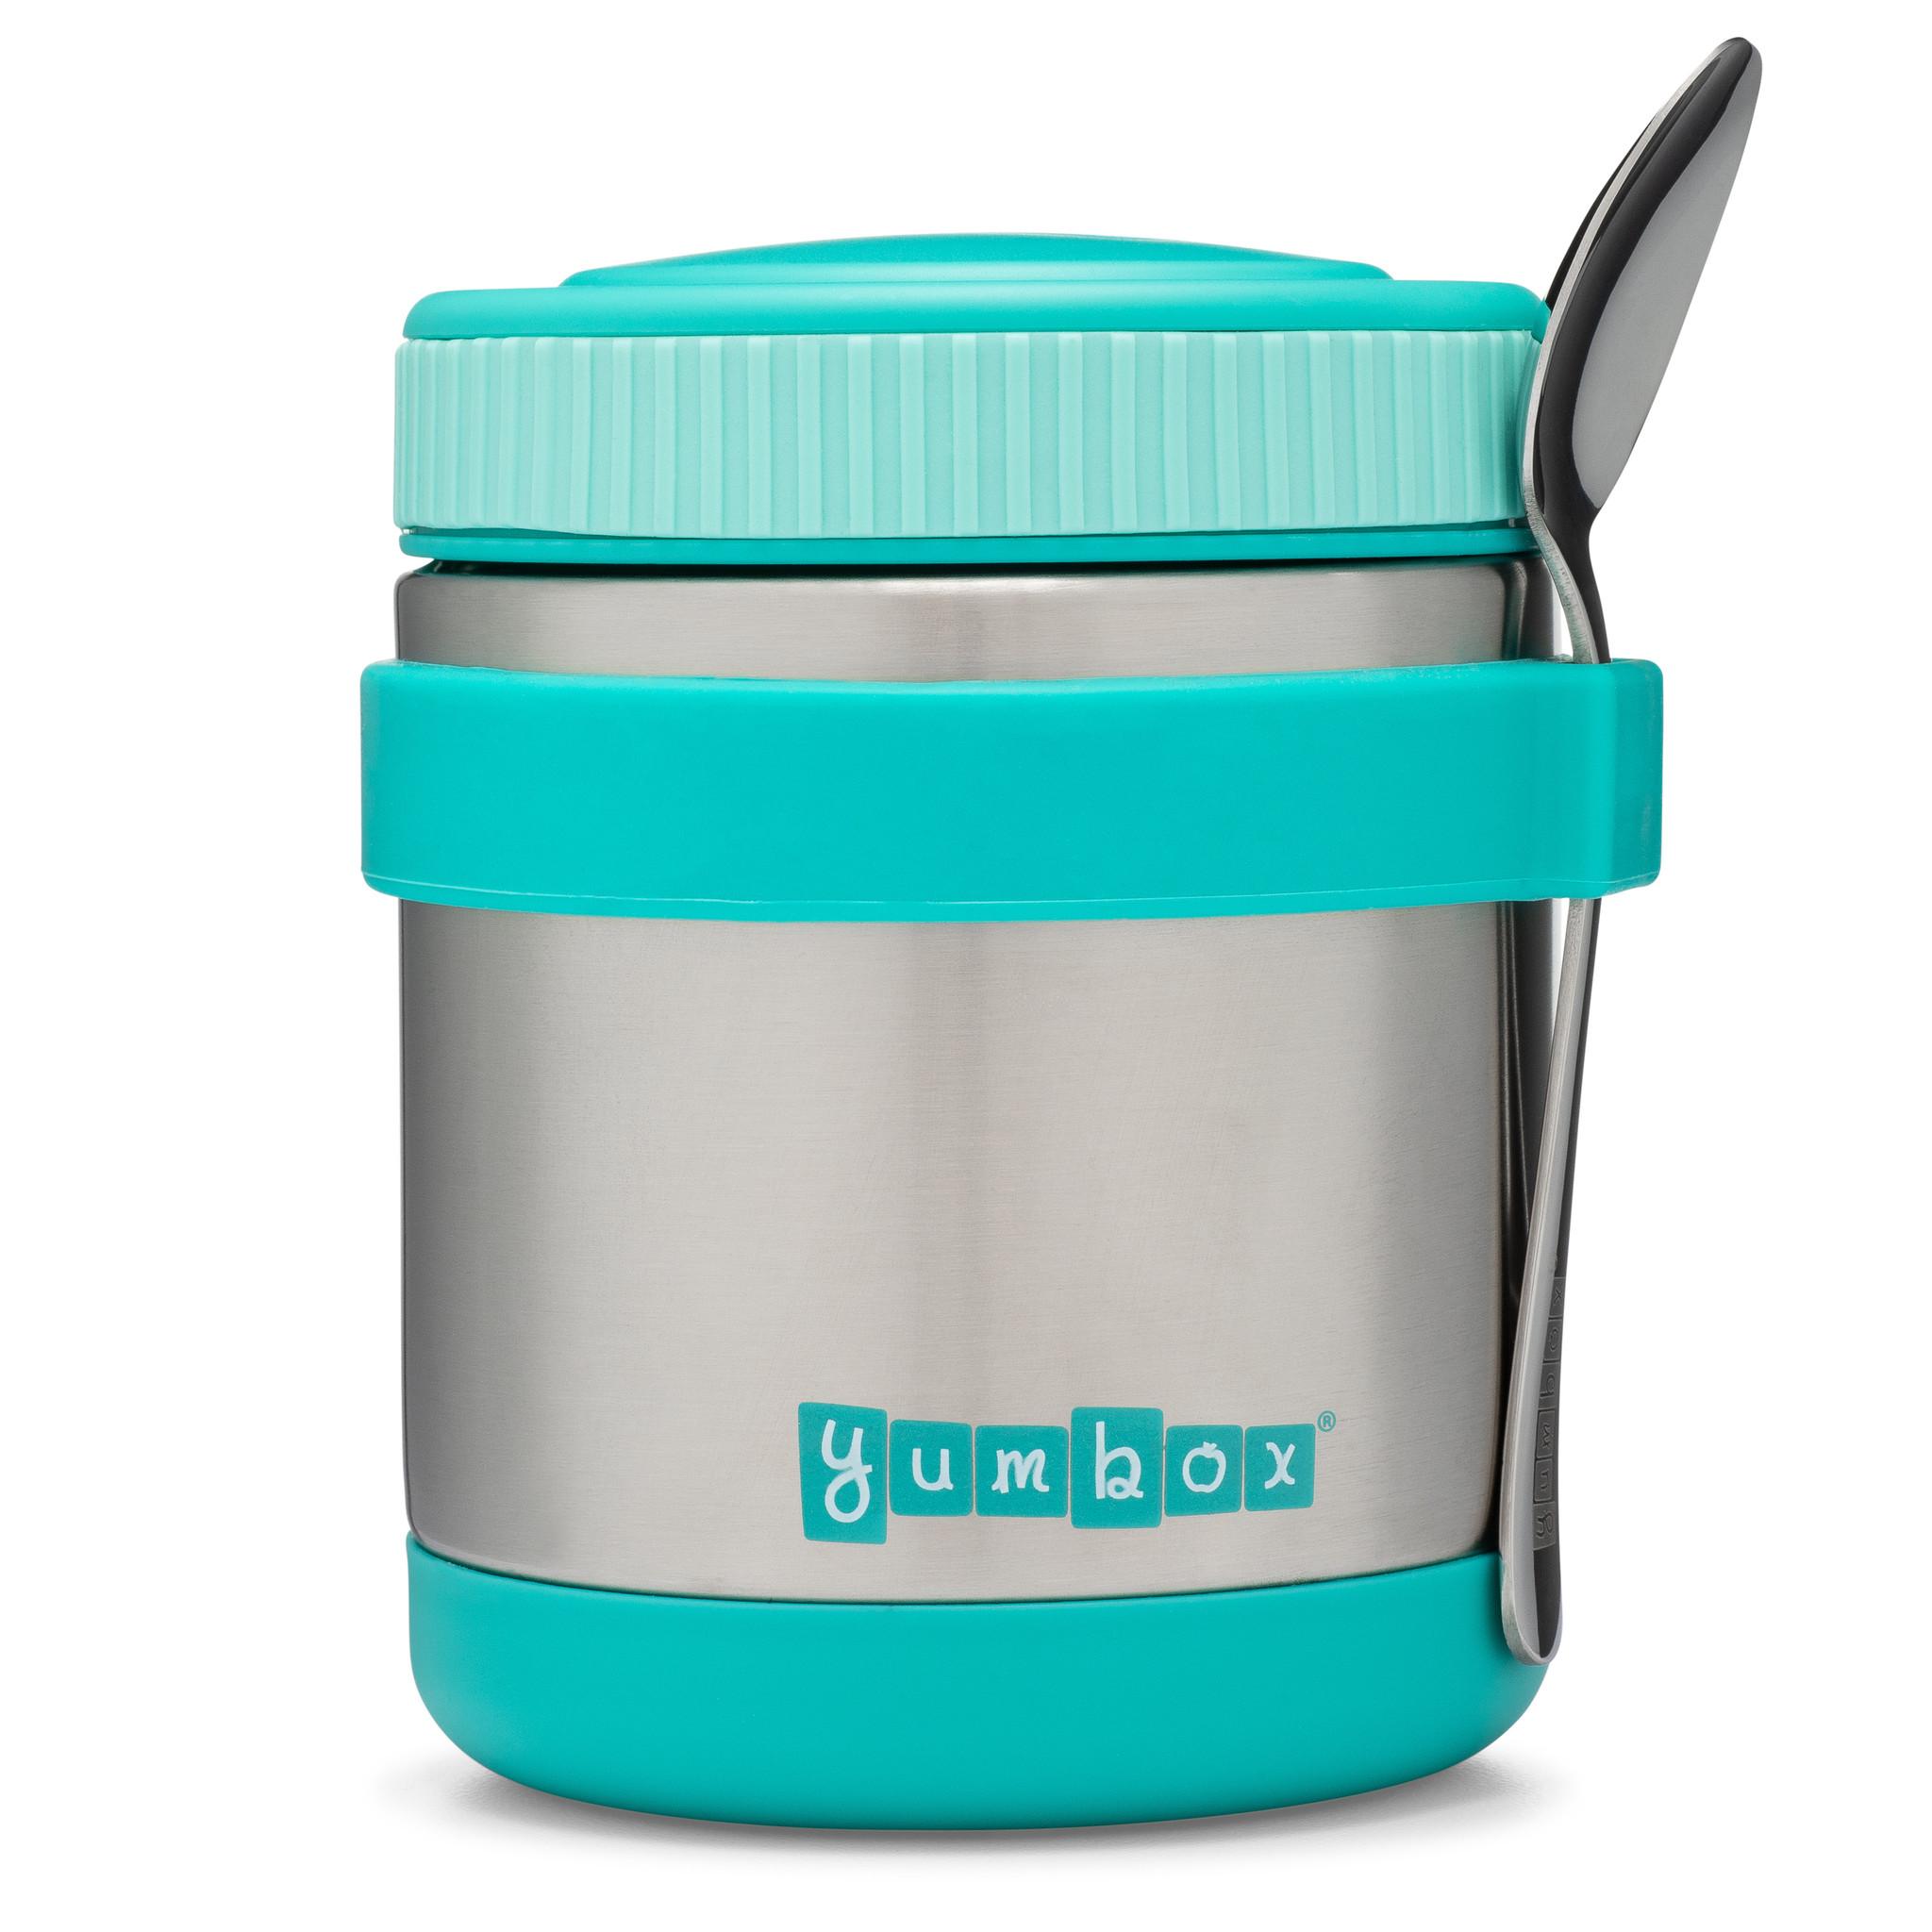 Yumbox Zuppa Caicos Aqua met lepel-1